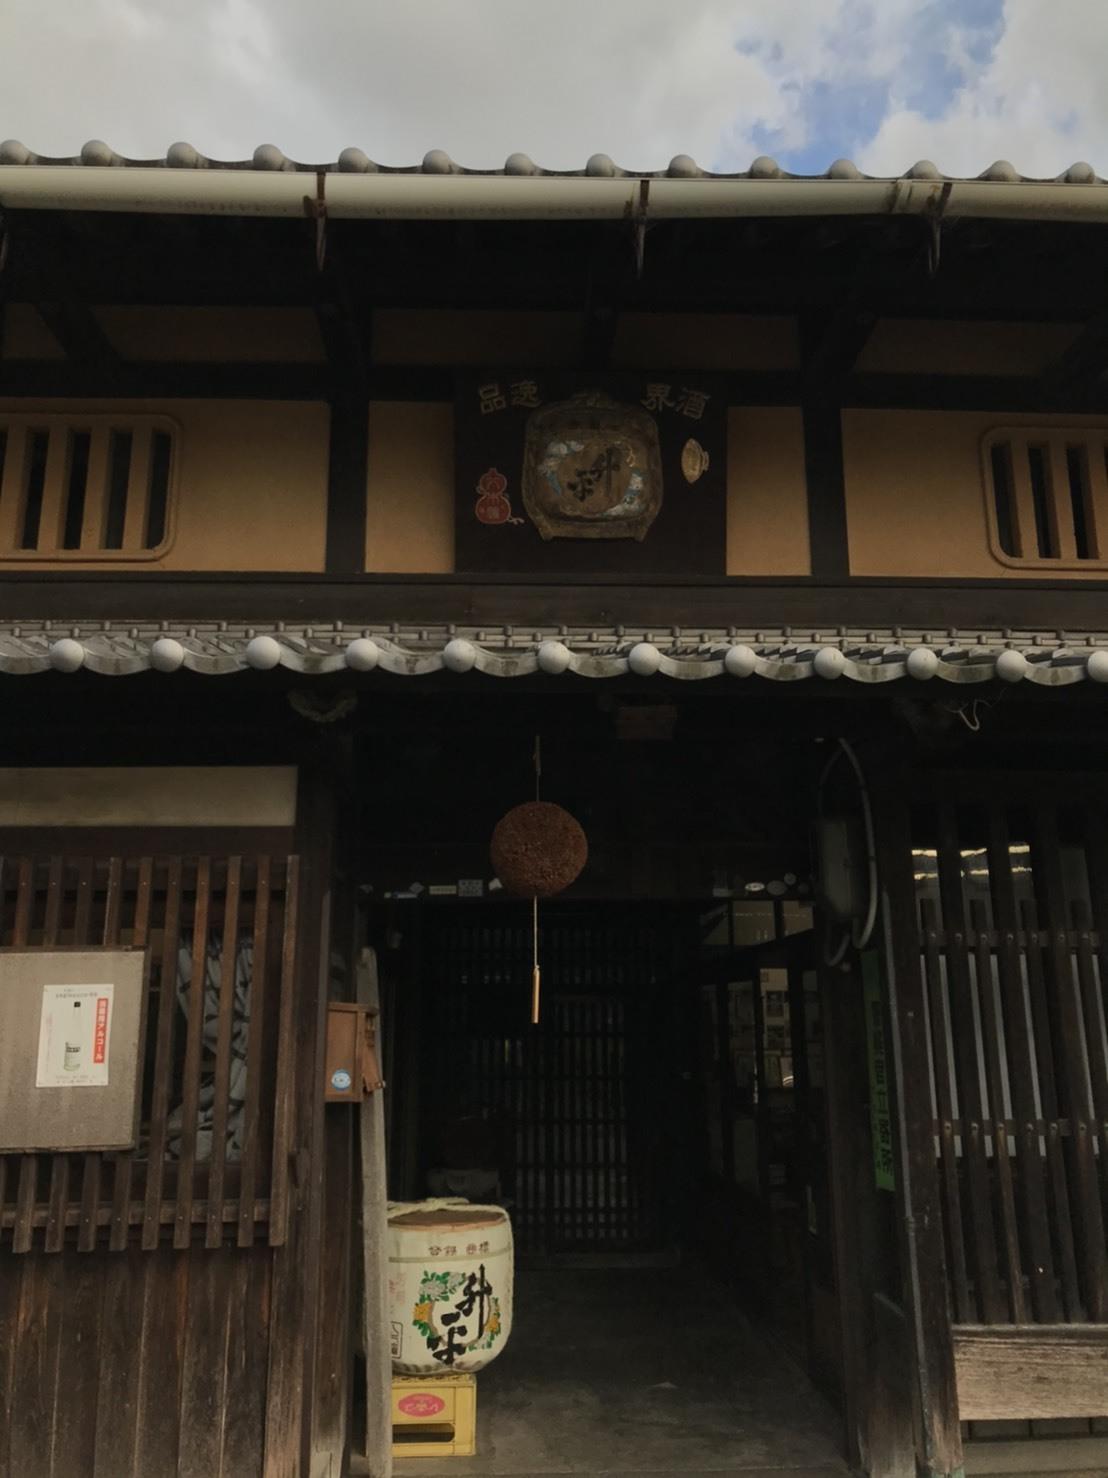 S__30376125.jpg